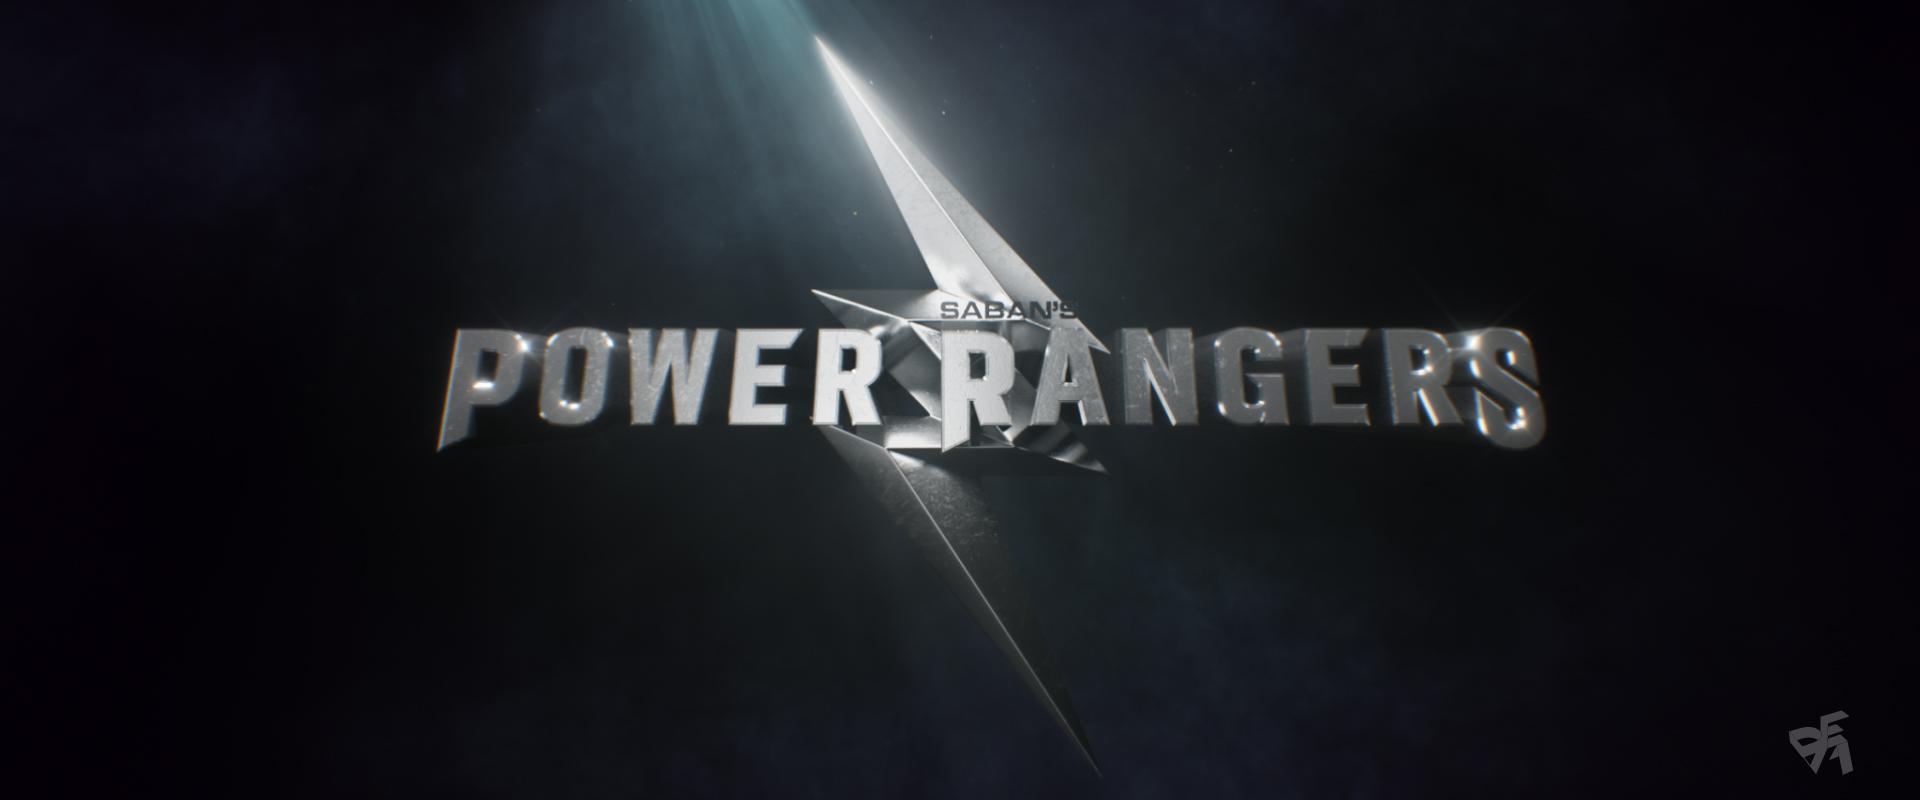 PowerRangers_STYLEFRAME_04.jpg